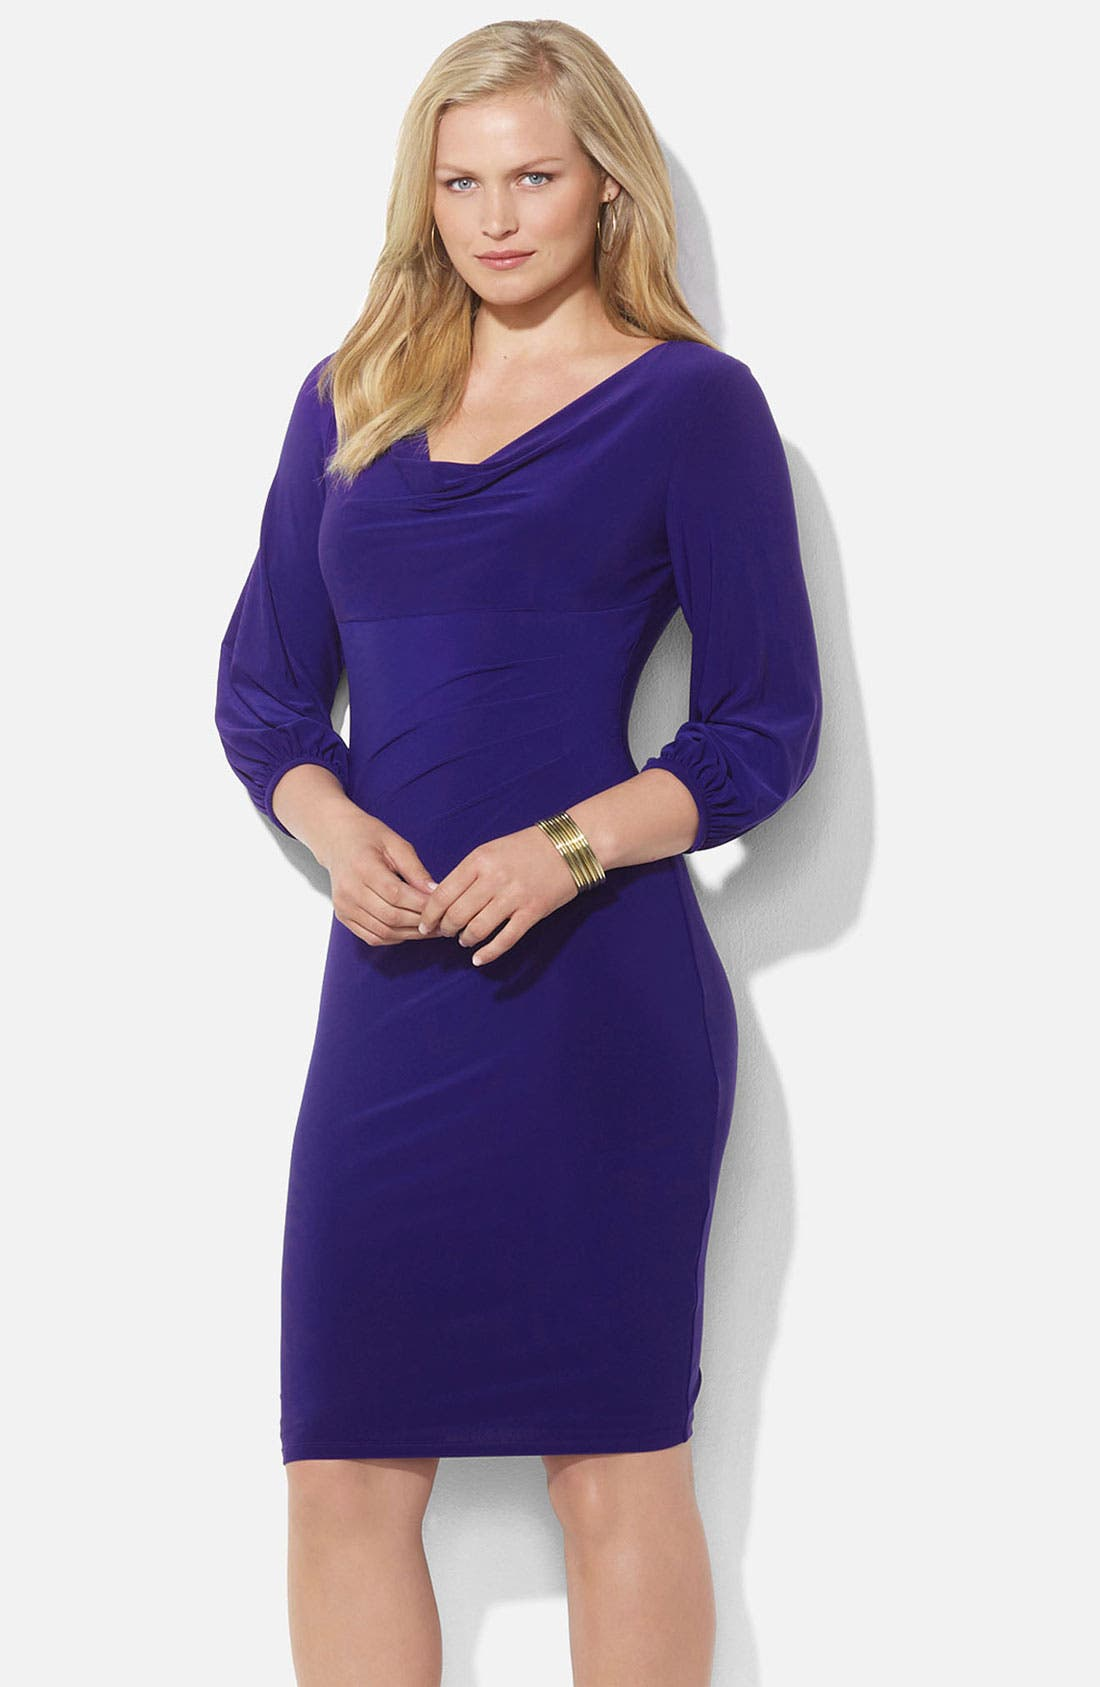 Alternate Image 1 Selected - Lauren Ralph Lauren Drape Neck Jersey Sheath Dress (Plus)